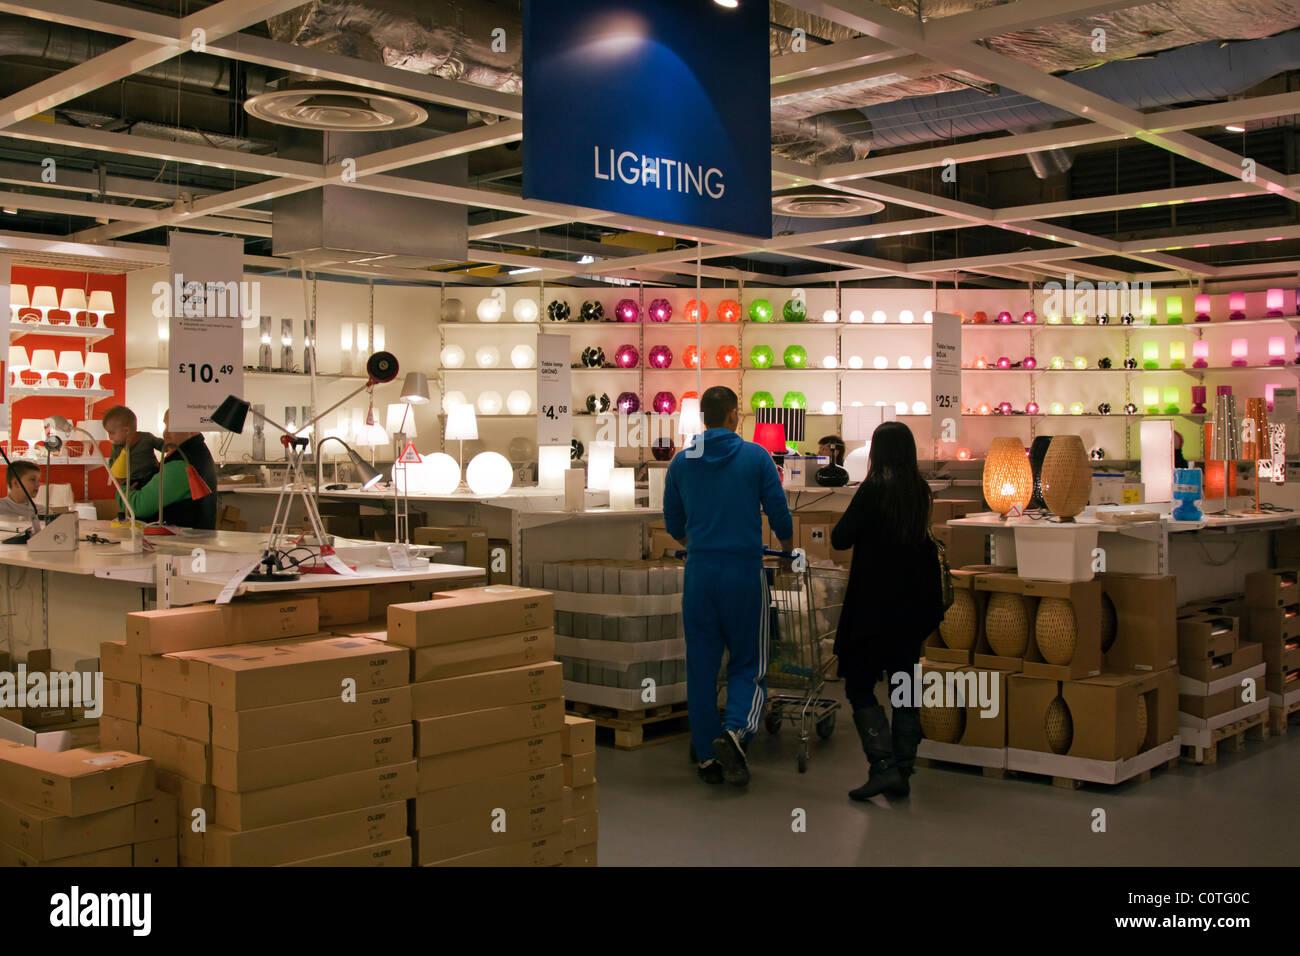 lighting department ikea store wembley london stock. Black Bedroom Furniture Sets. Home Design Ideas